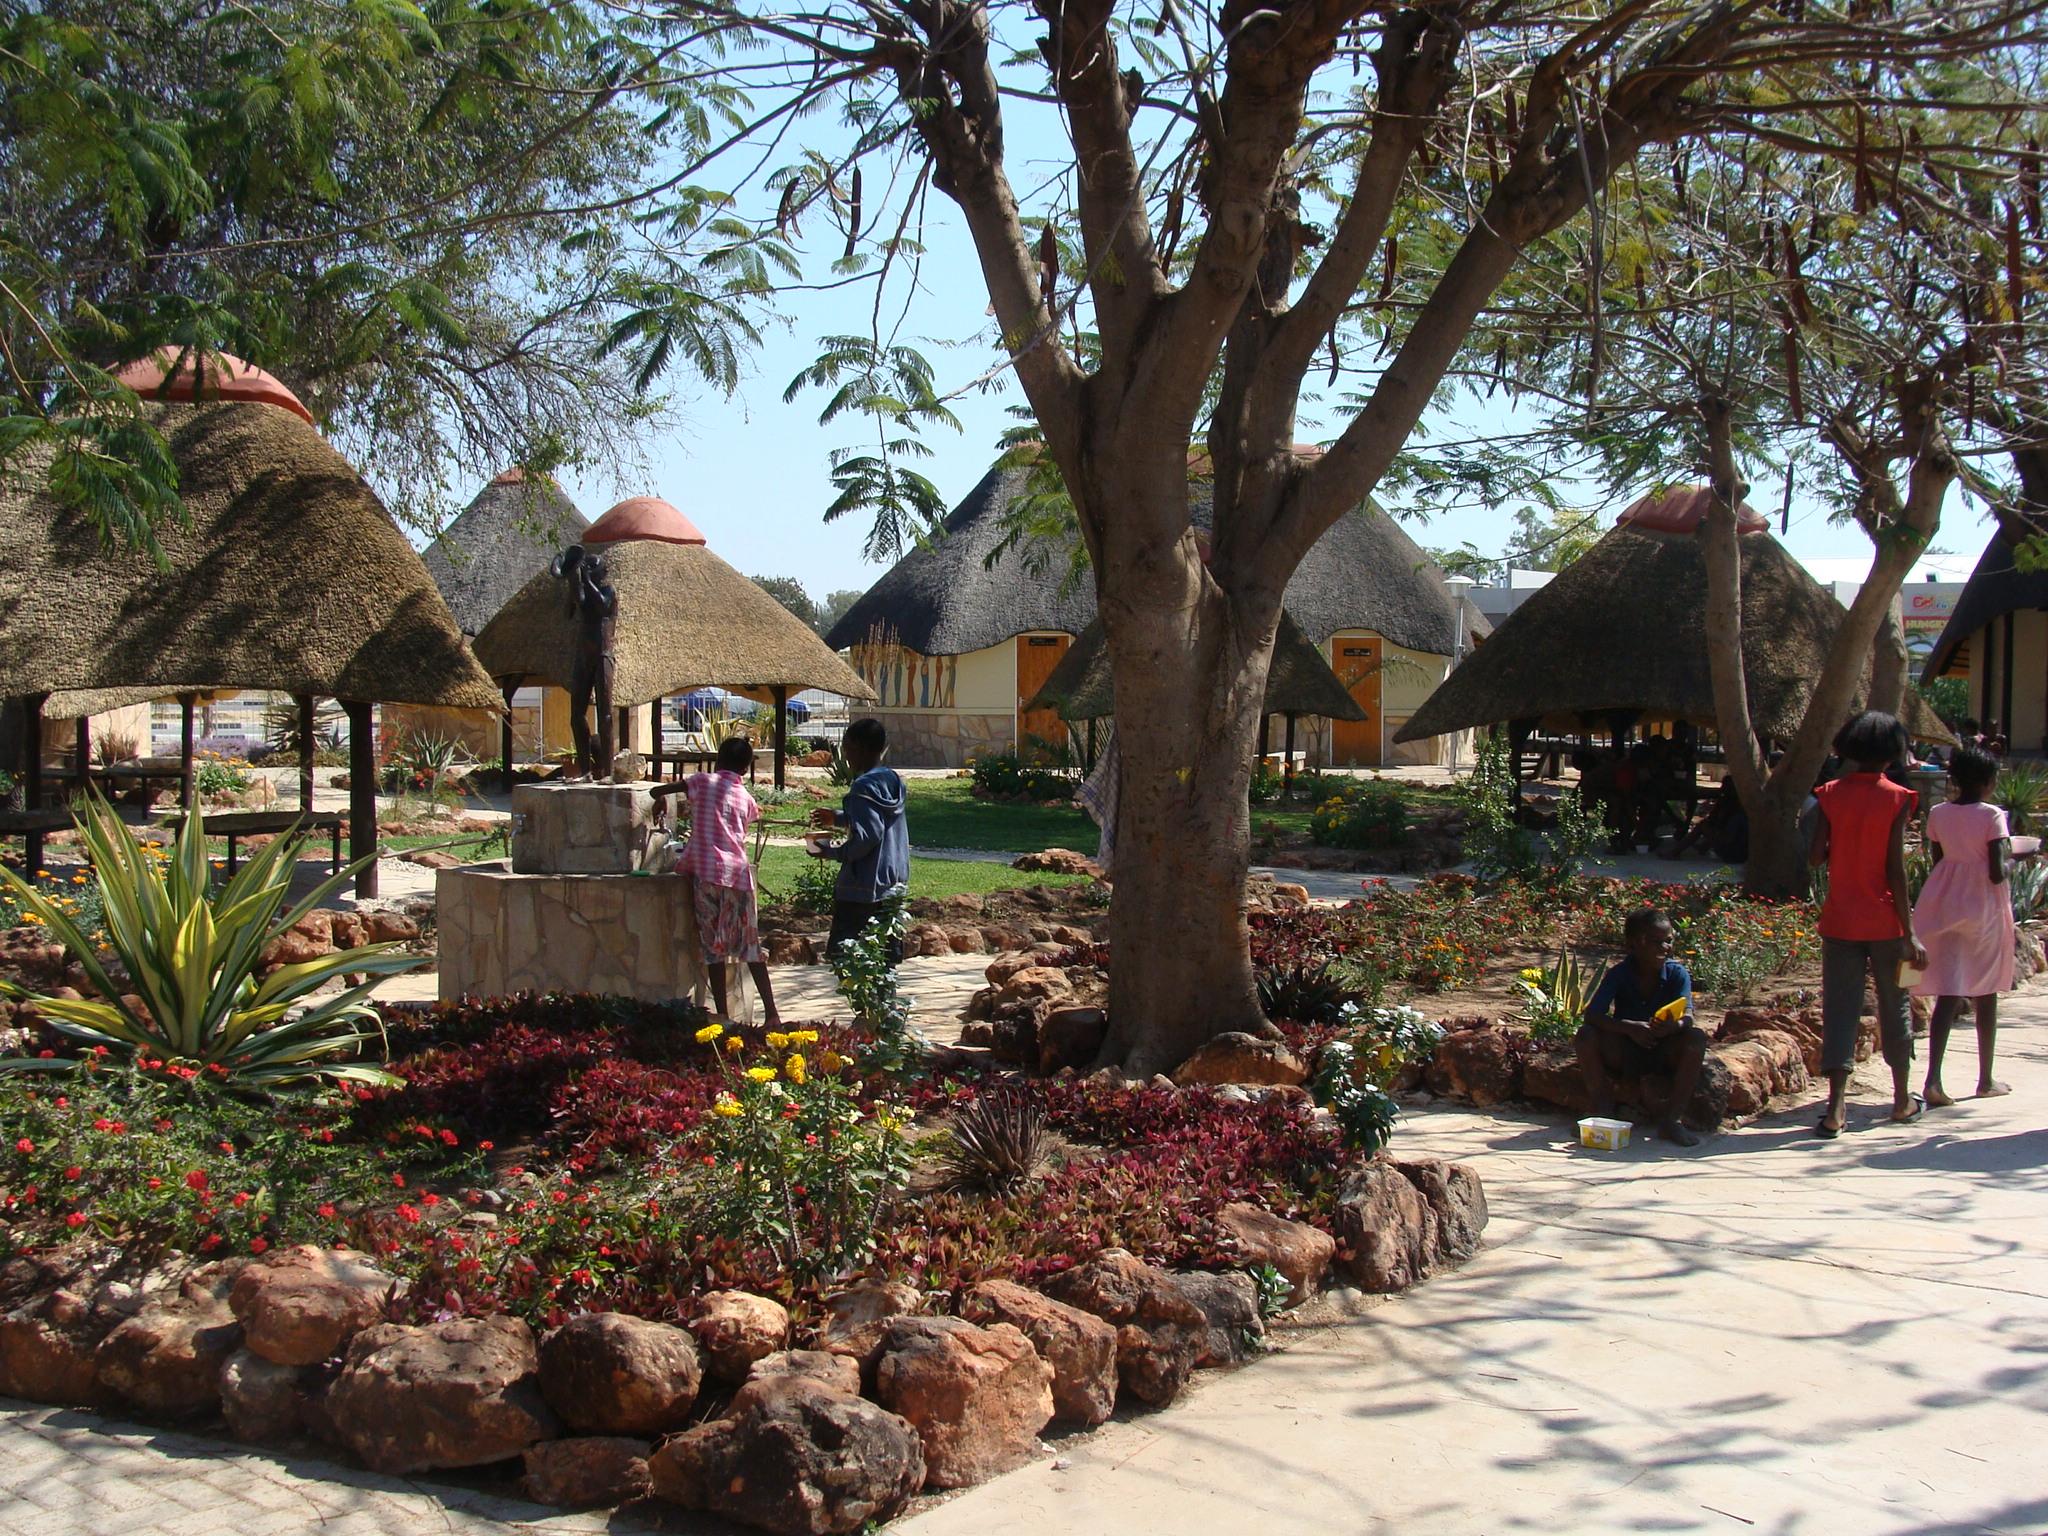 Tsumeb Namibia  city images : Arts Performance Centre, Tsumeb Namibia | Baobab Guides